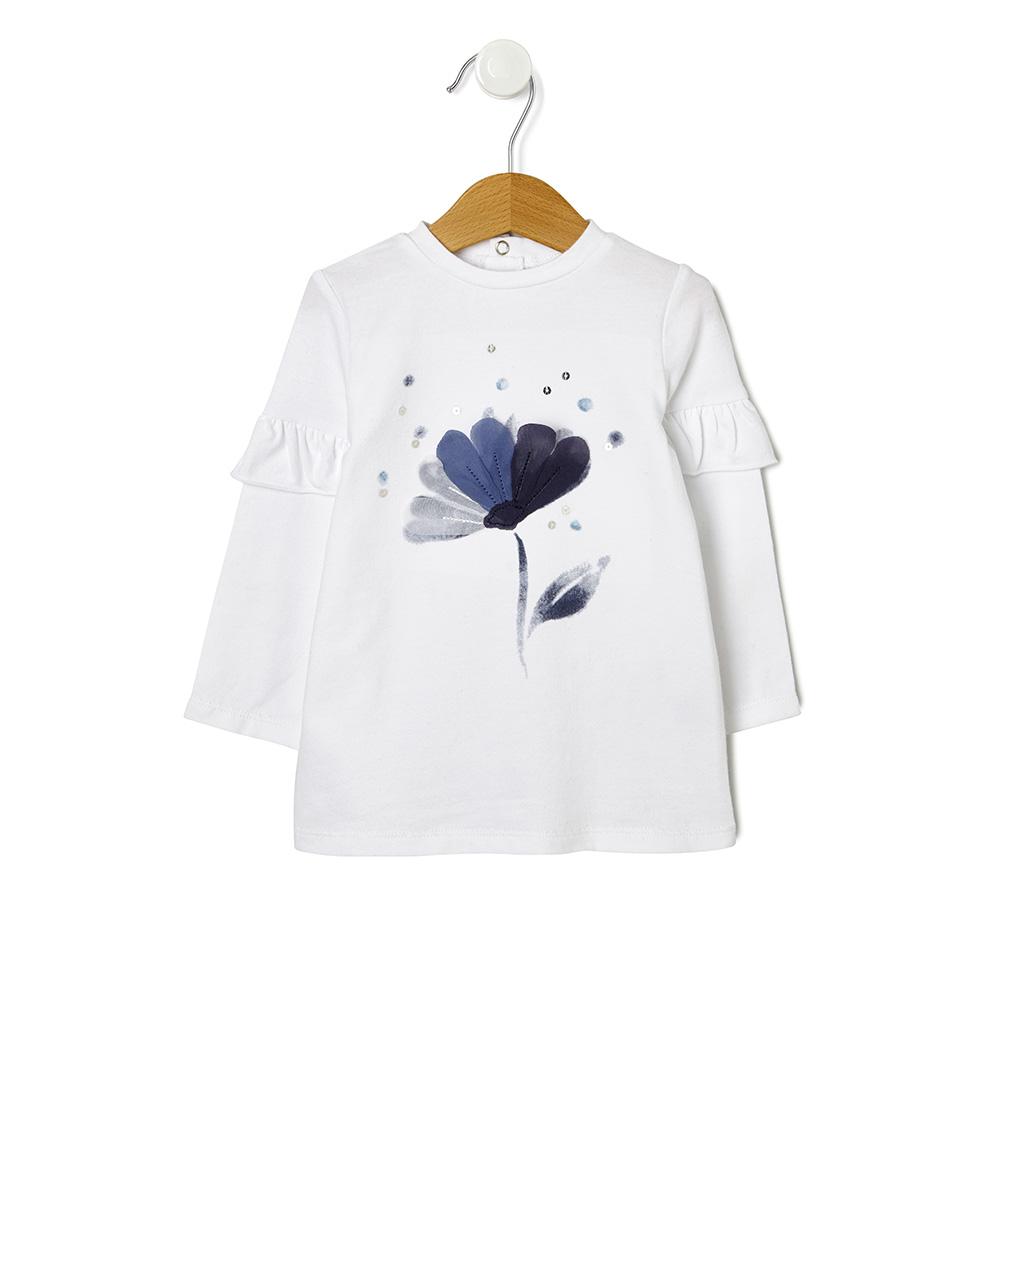 T-shirt con fiore - Prénatal